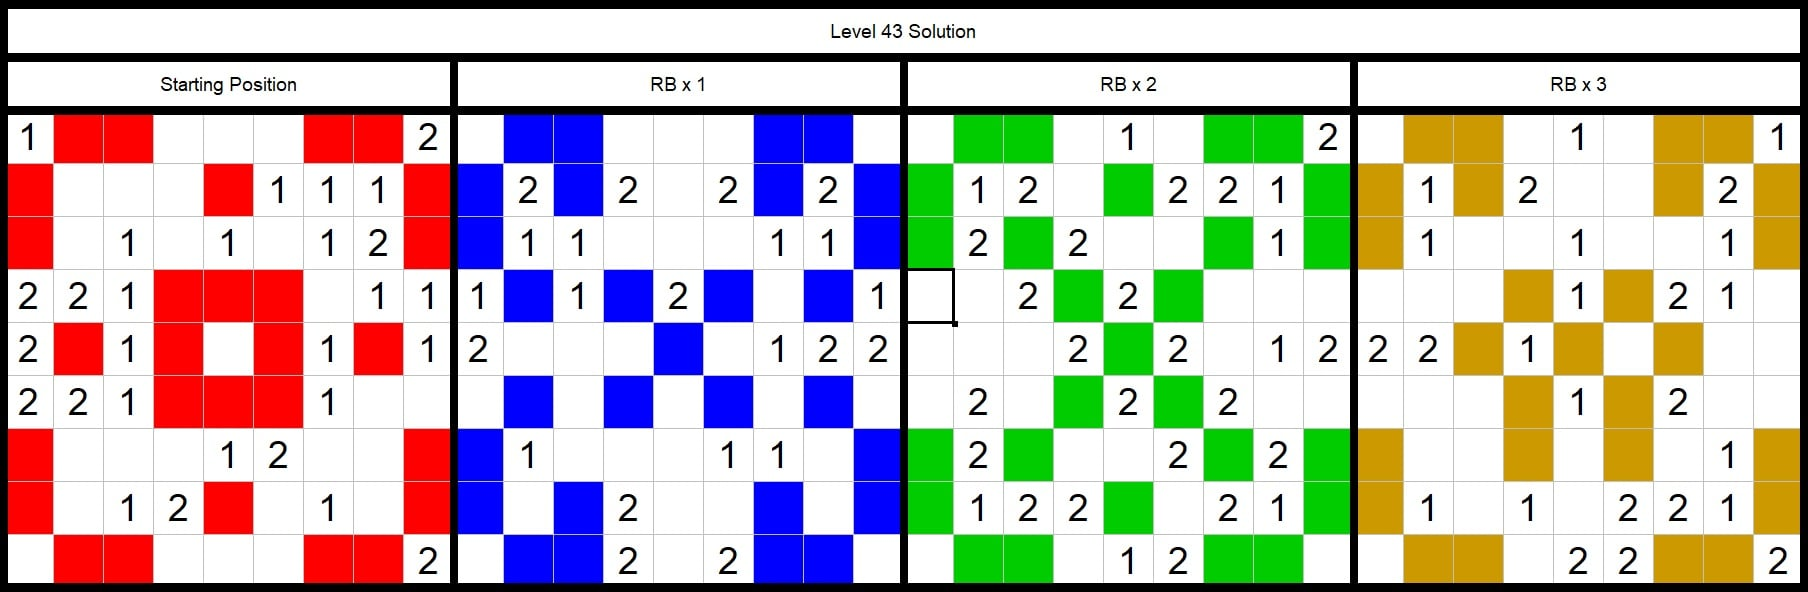 Level 43 Solution